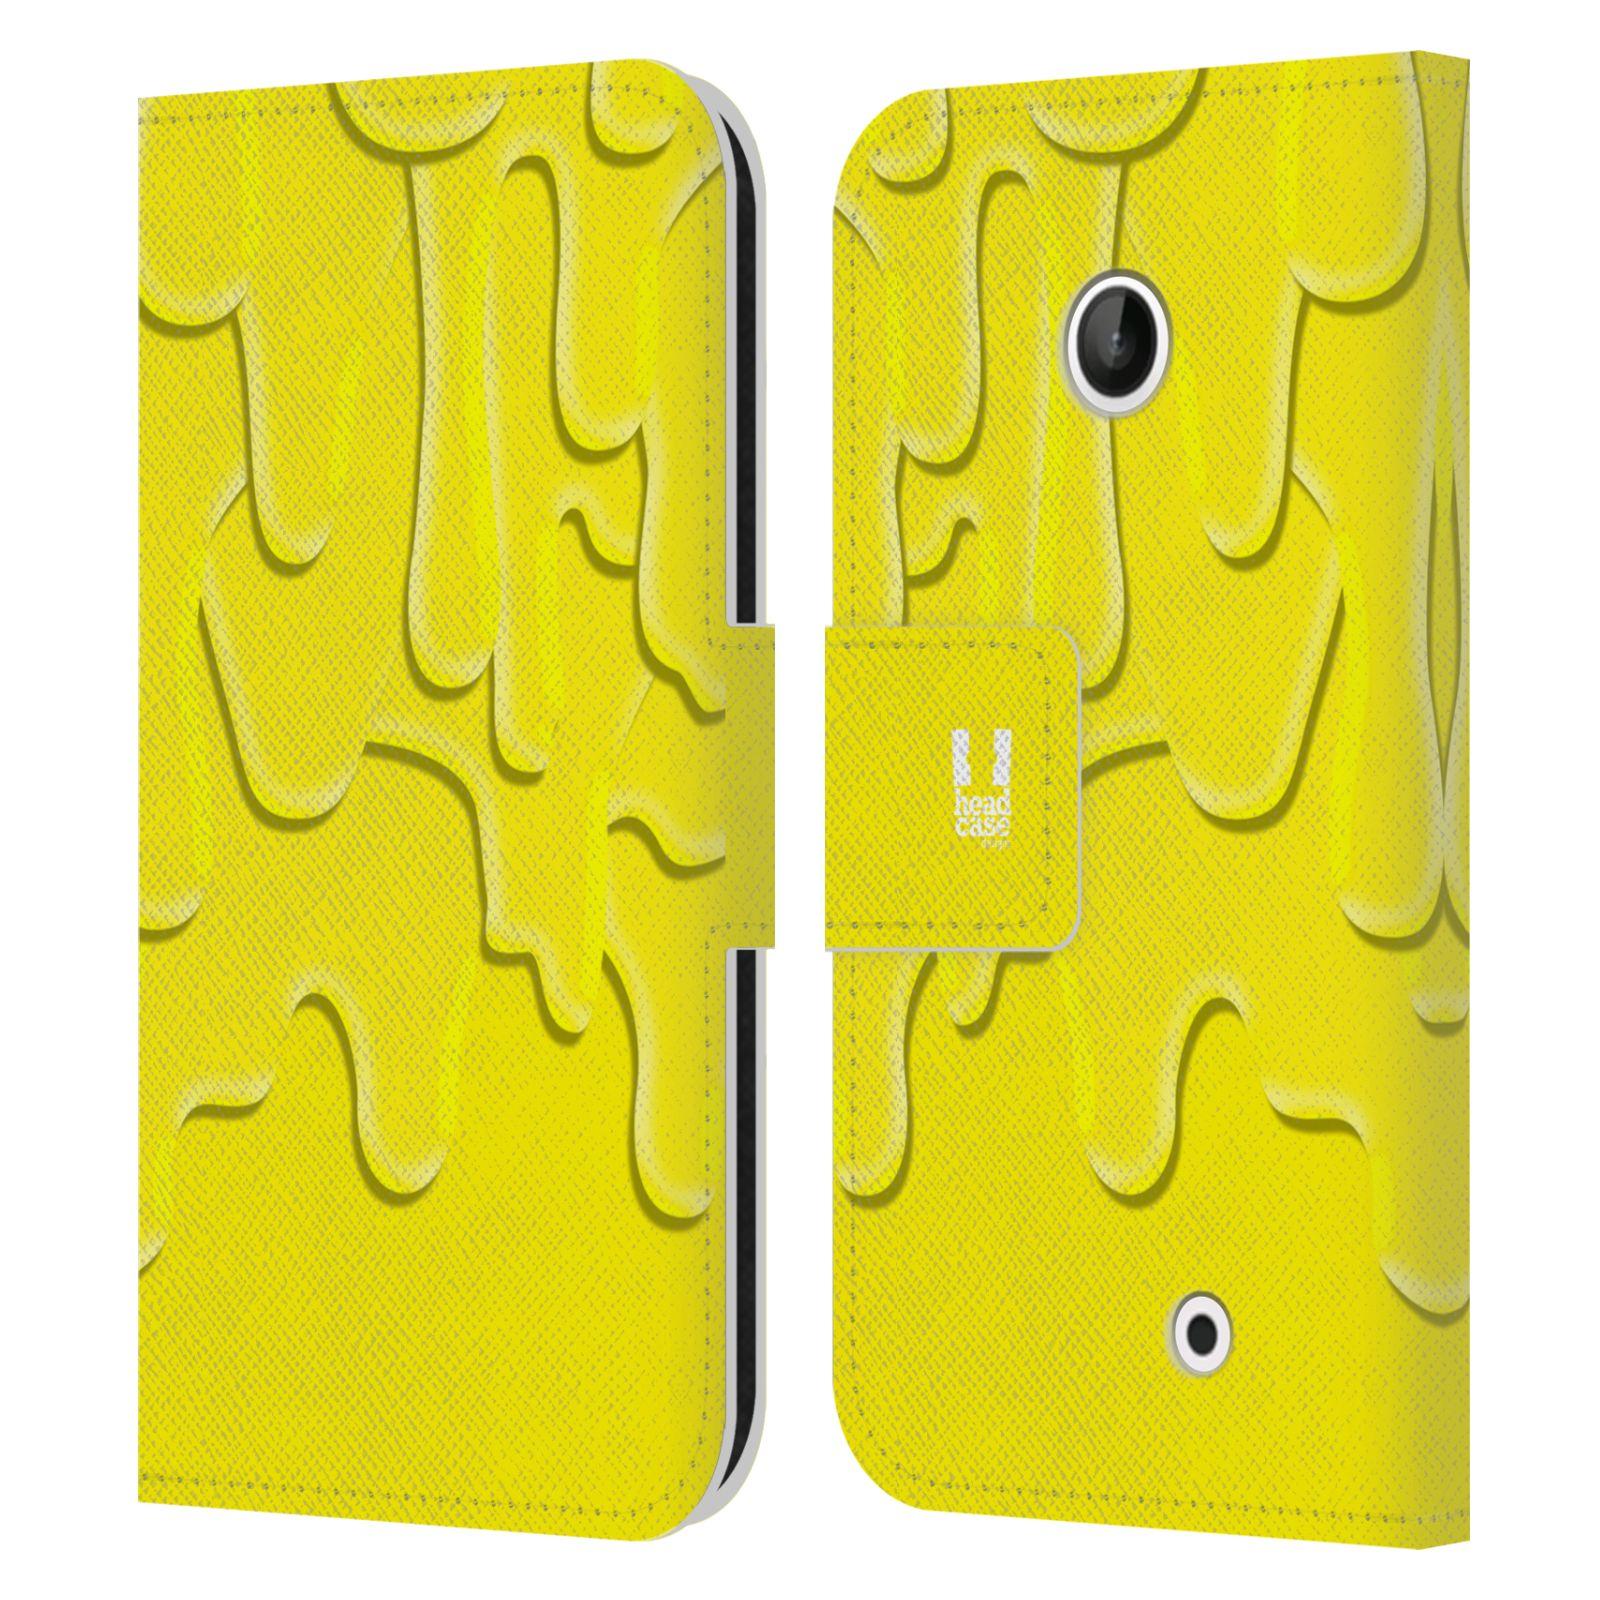 HEAD CASE Flipové pouzdro pro mobil NOKIA LUMIA 630 / LUMIA 630 DUAL ZÁPLAVA BARVA žlutá